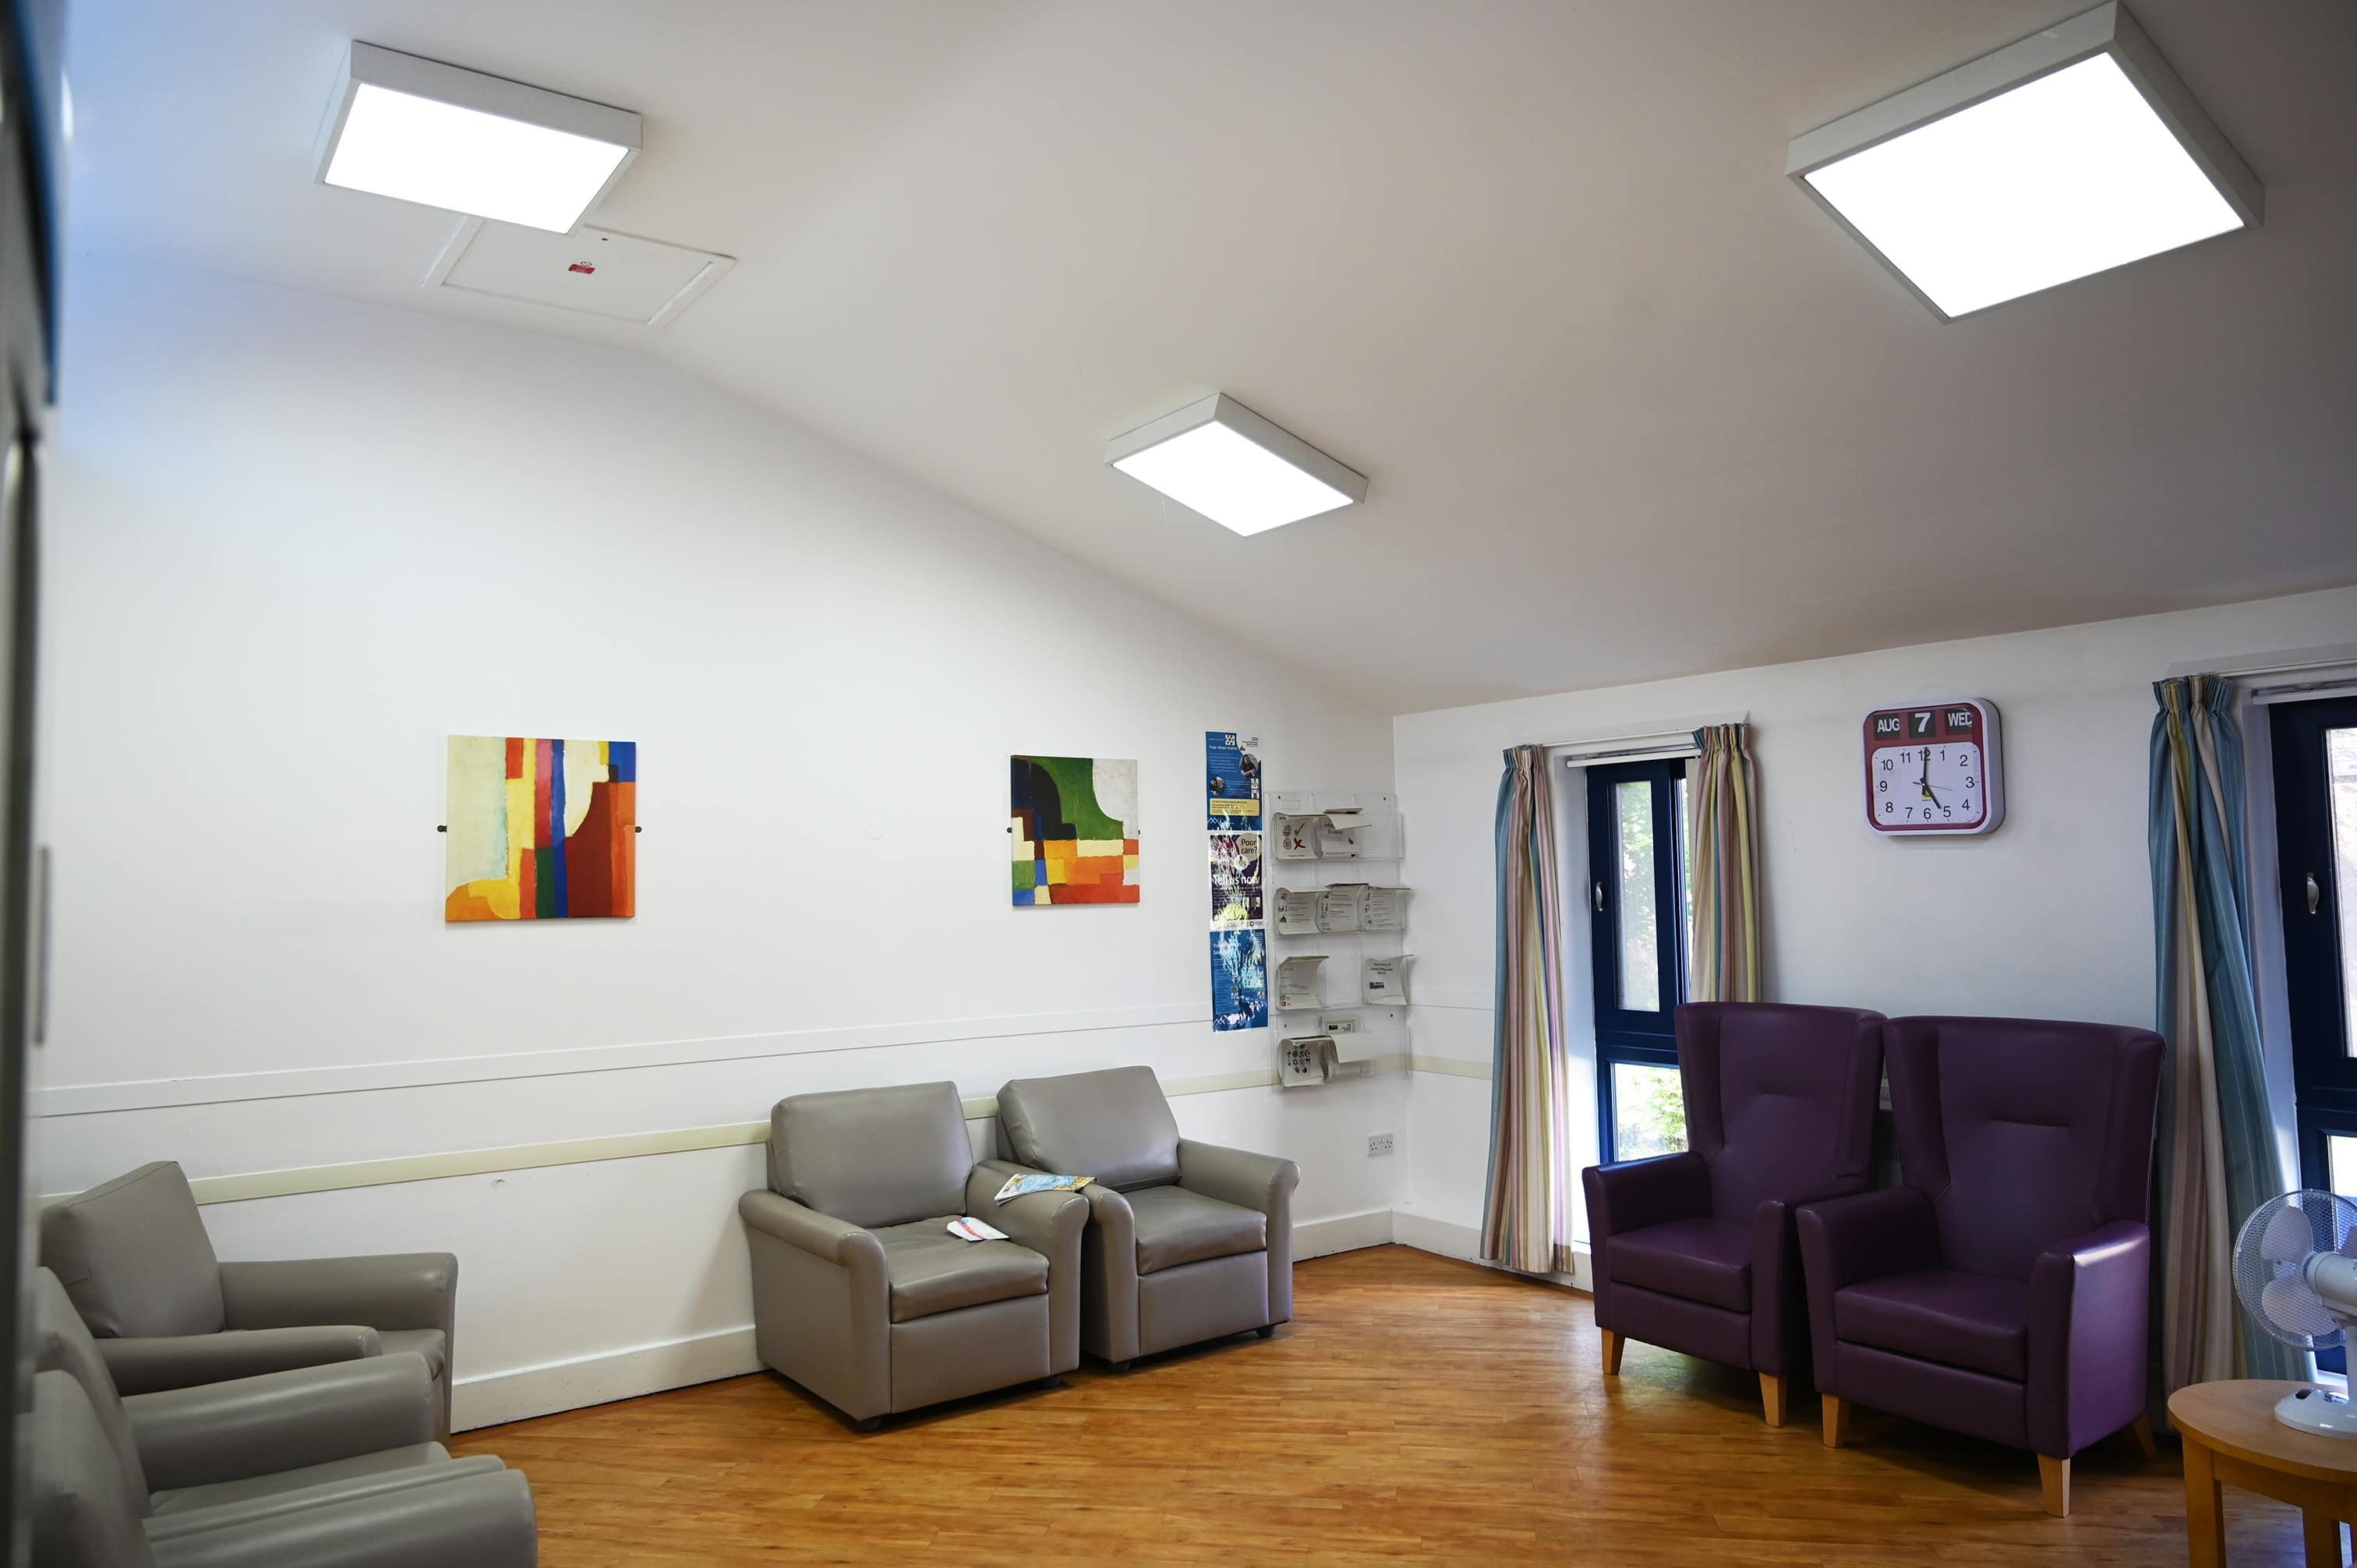 Prestwich Hospital - Living Room